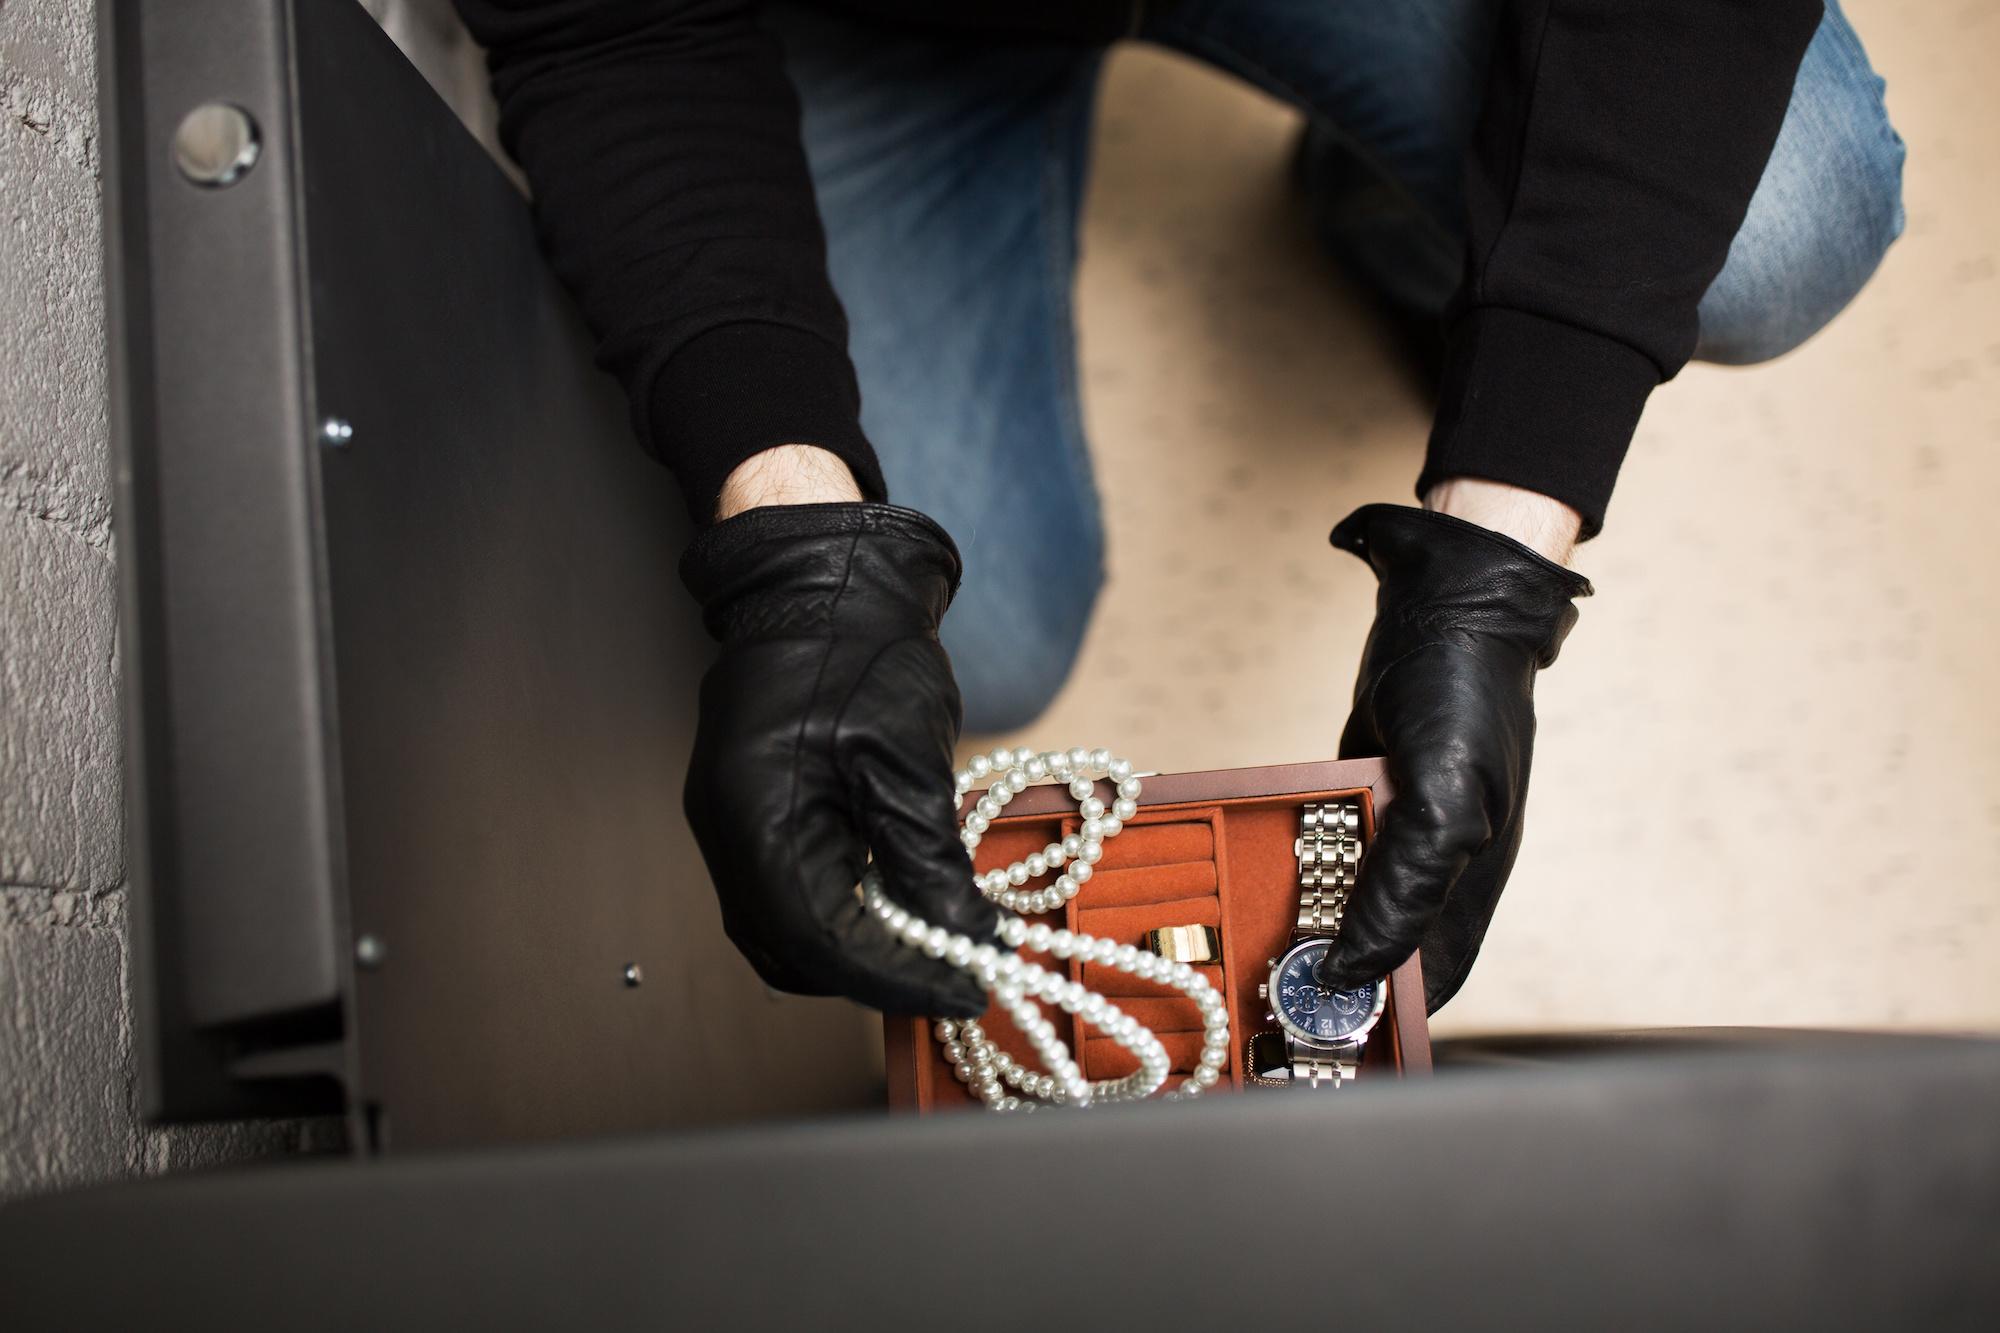 Jewelry, cash stolen during Erin break and enter